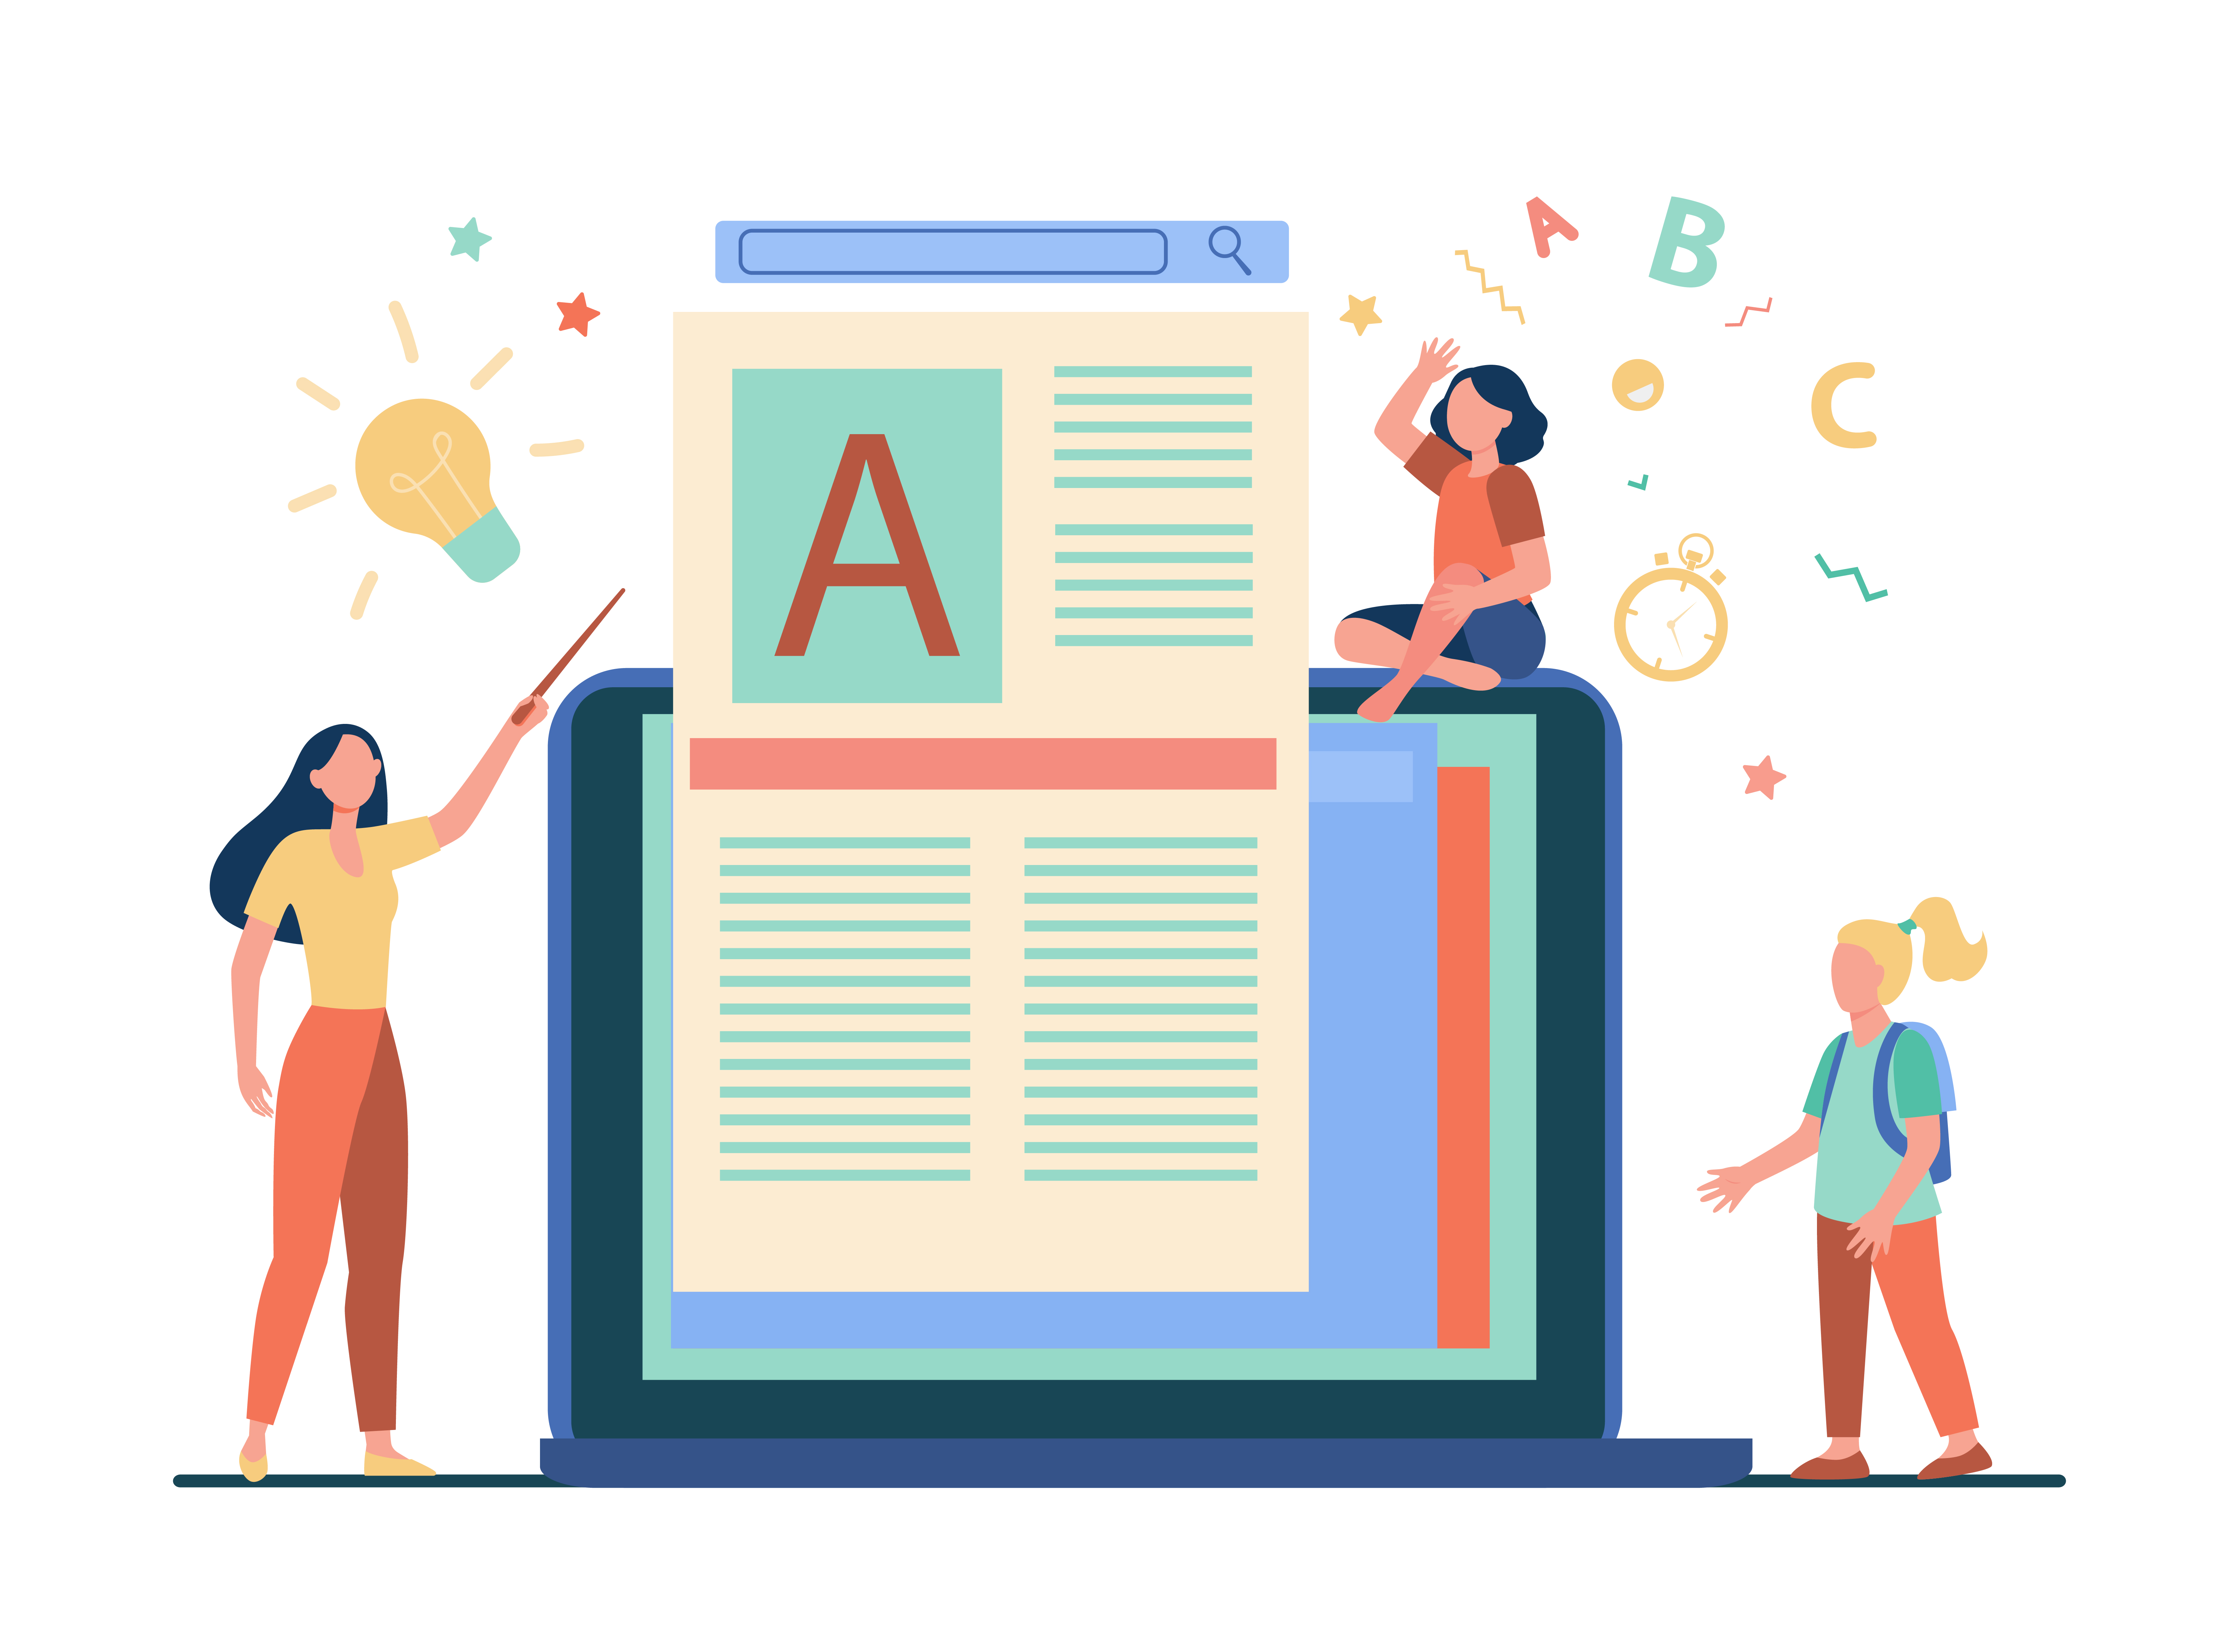 evaluate-student-understanding-with-interactive-video